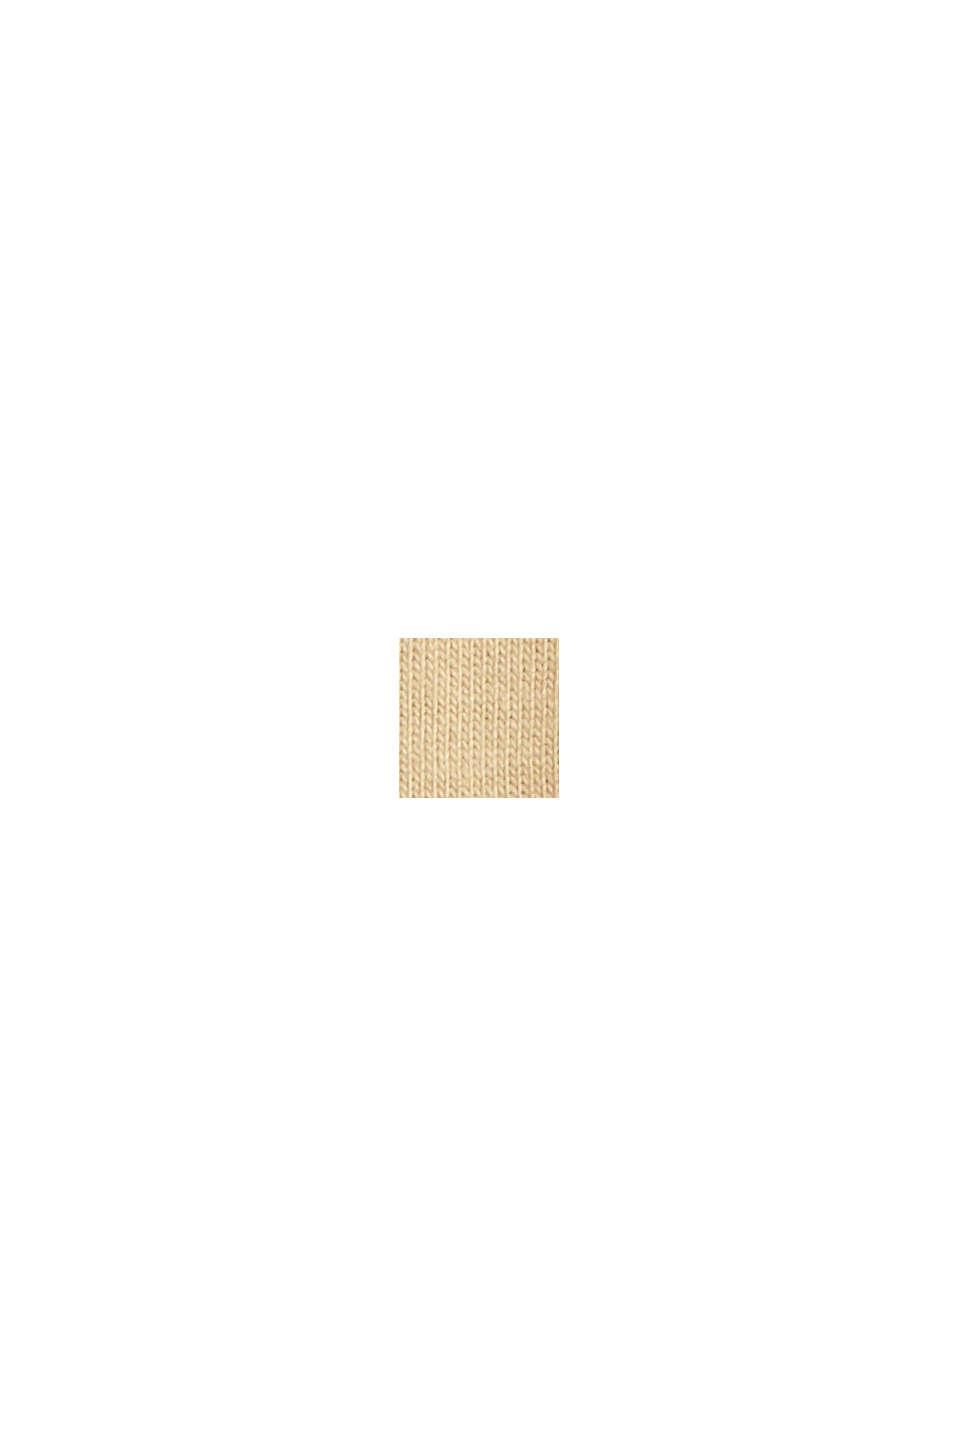 Jersey long sleeve top in organic cotton, BEIGE, swatch